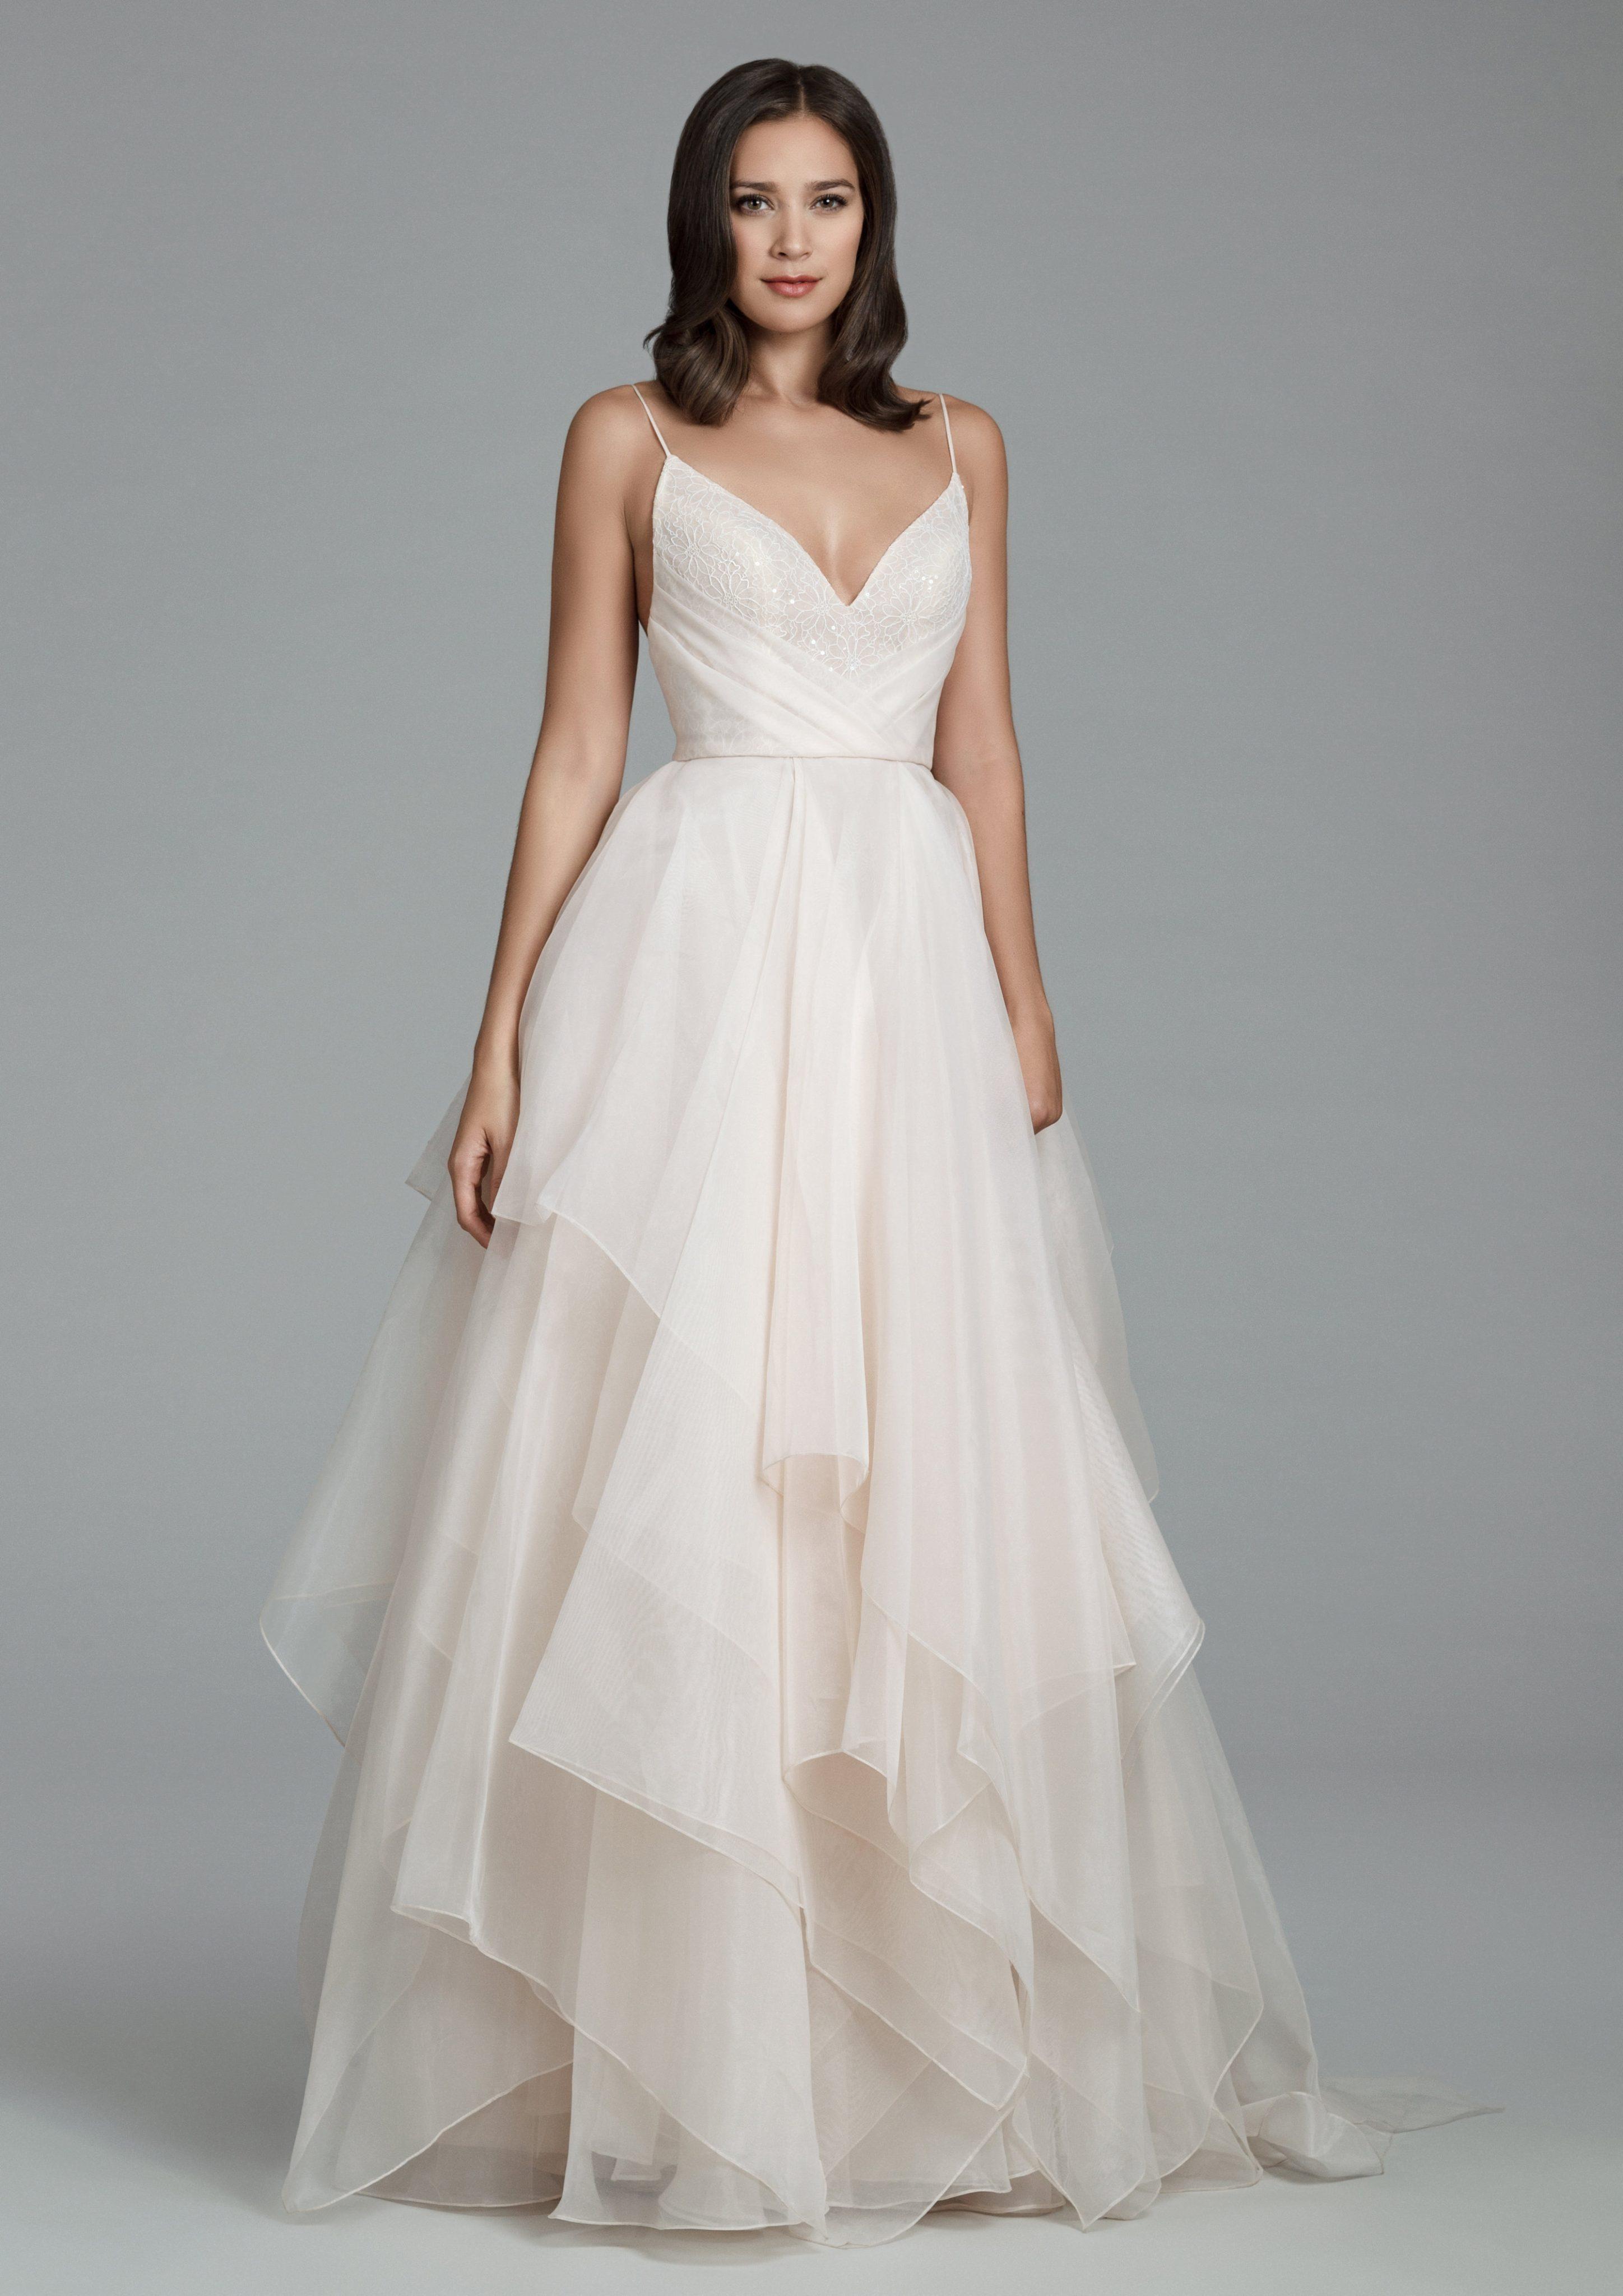 dc0bc4965e February 201815.000 Beautiful Wedding Guest Dress Ideas